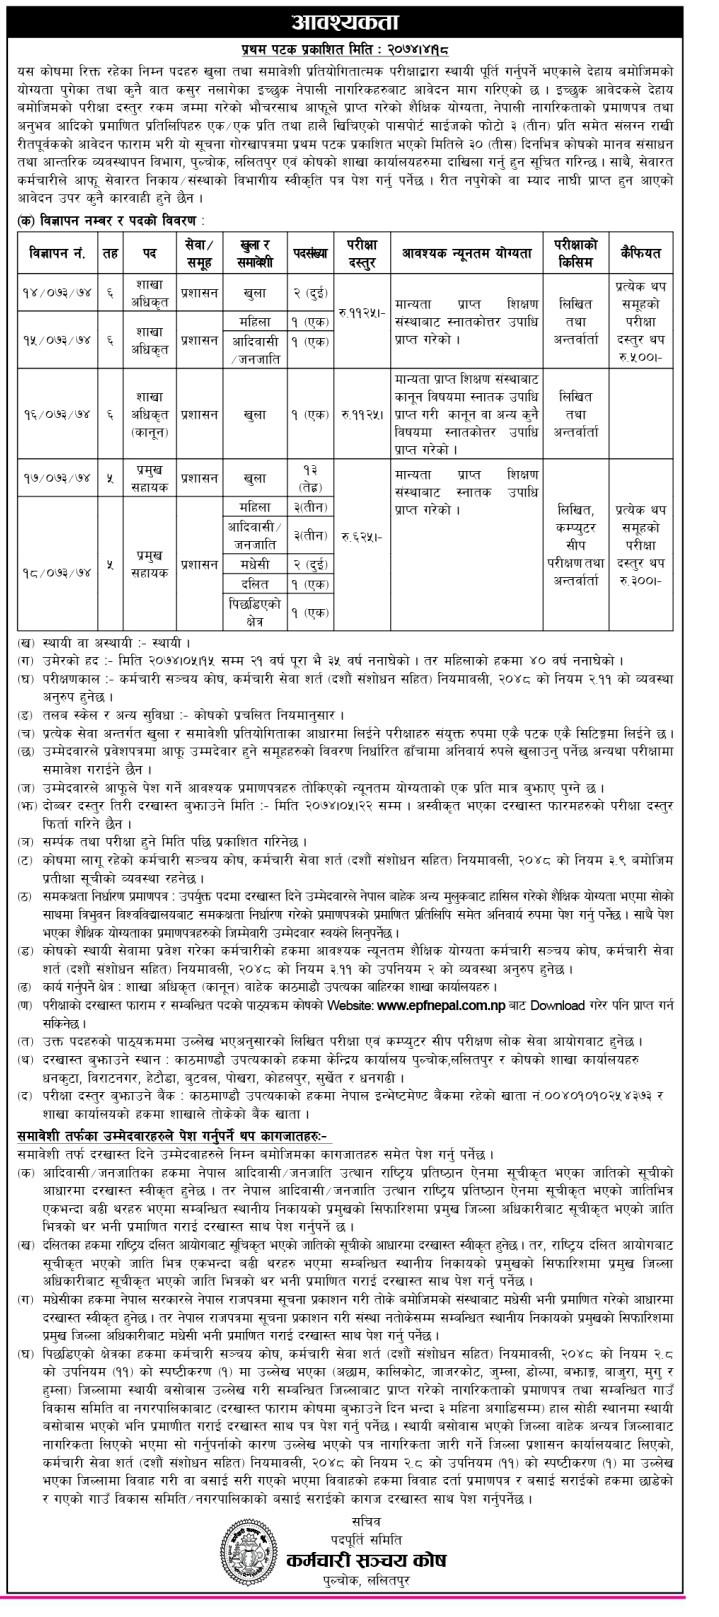 Nepal Government Job In Karmachari Sanchaya Kosh